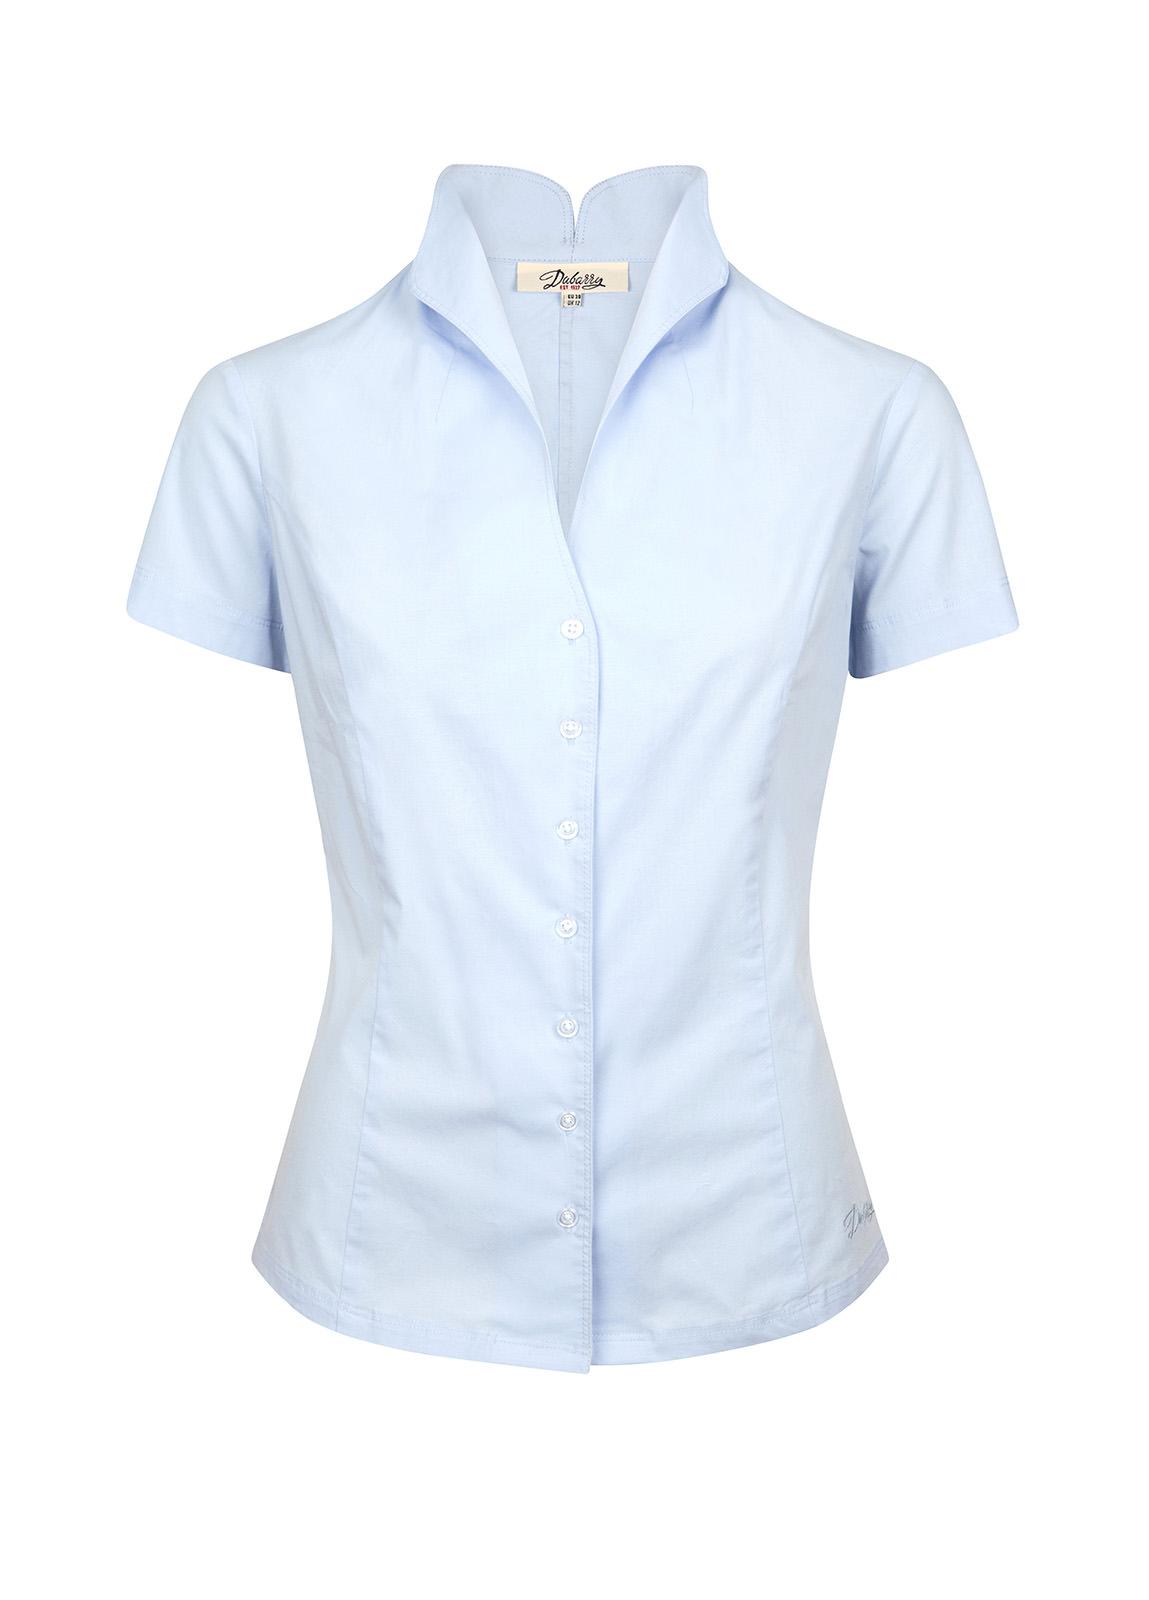 Dubarry_ Starflower Short Sleeve Women's Shirt - Pale Blue_Image_2